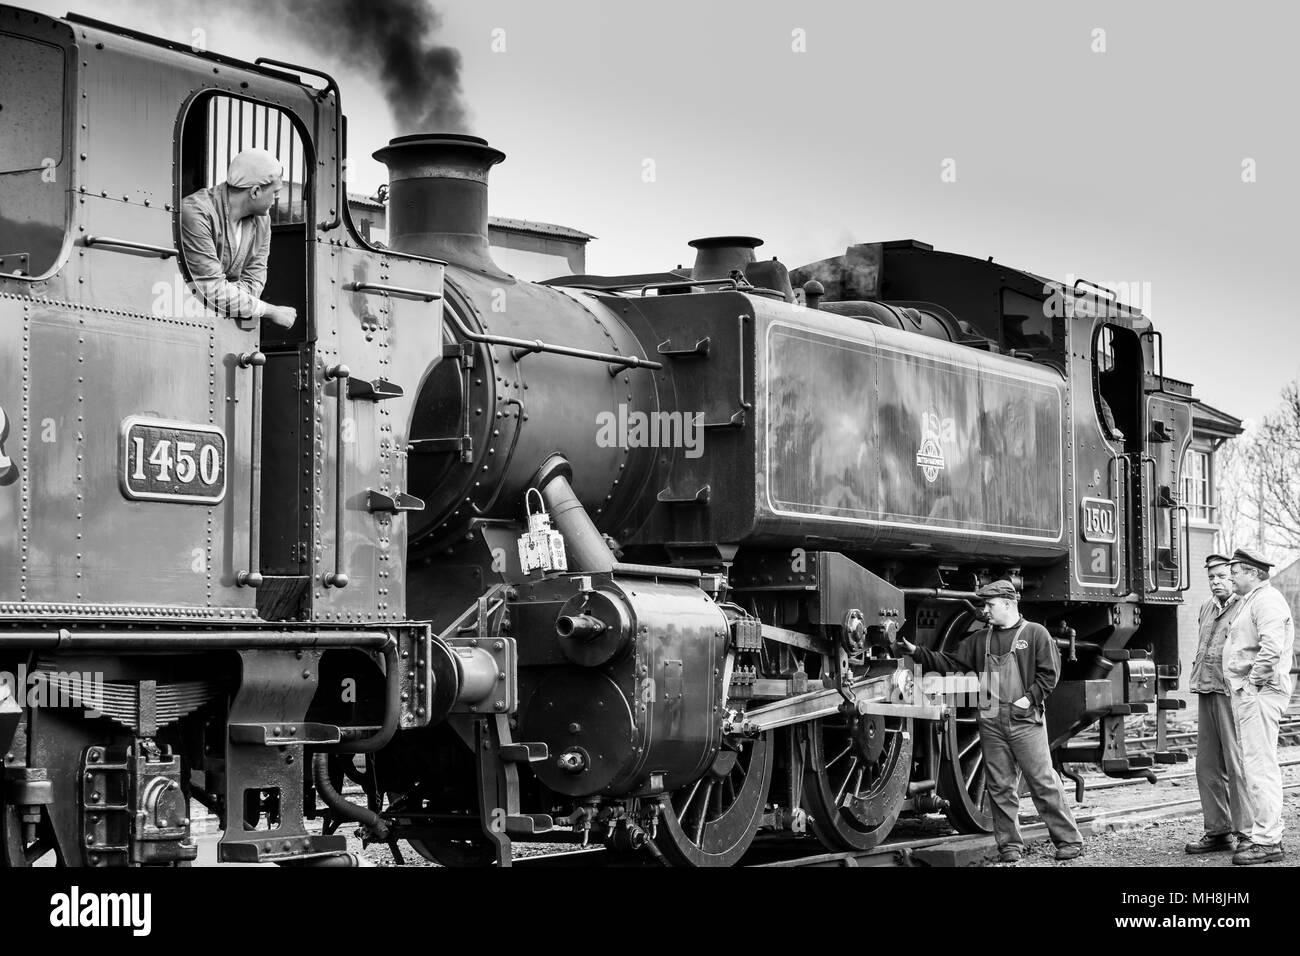 Preserved steam engines on Severn Valley Railway heritage line awaiting departure. Black & white landscape image reflecting nostalgia of bygone era. - Stock Image